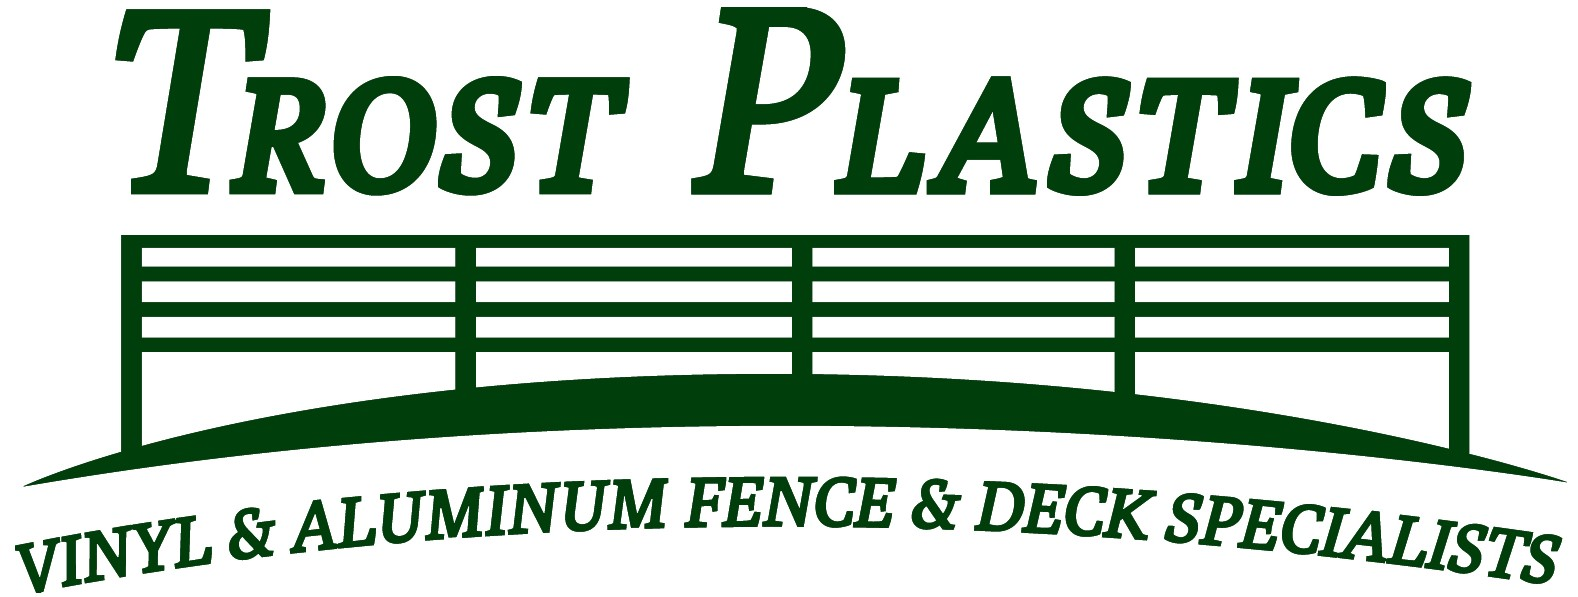 Trost Plastics